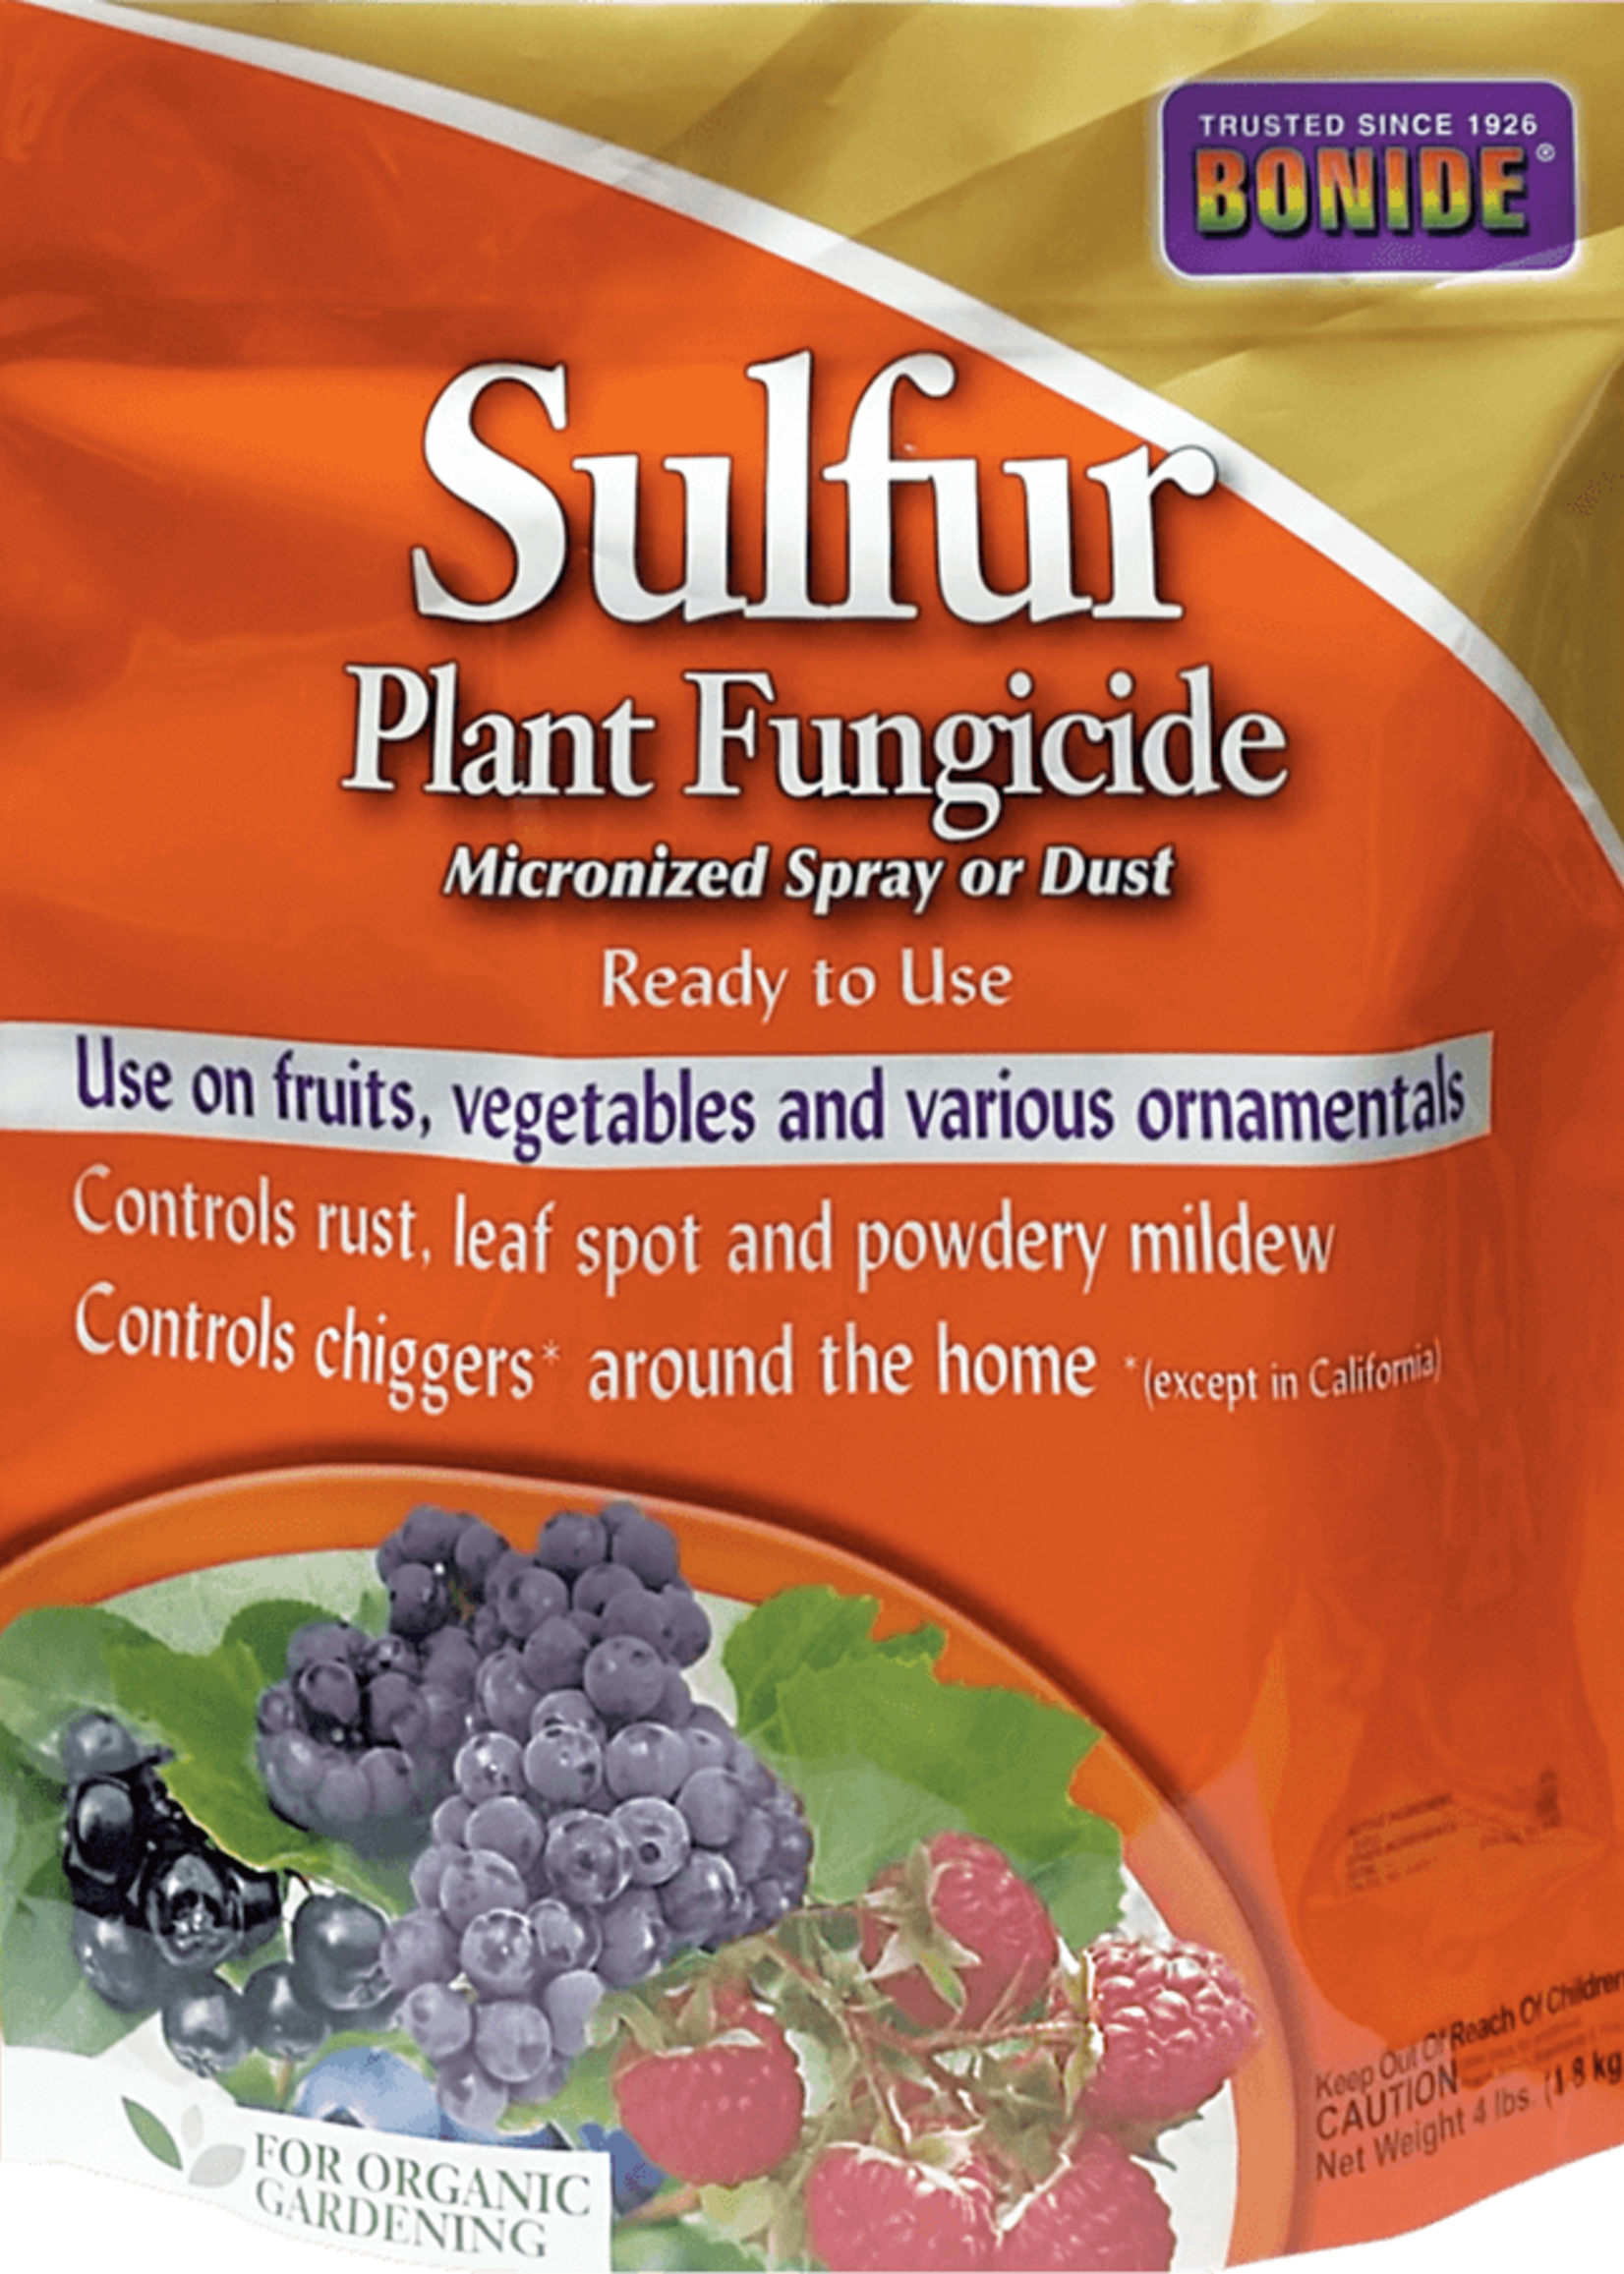 BONIDE Sulfur Plant Fungicide 4 lbs.